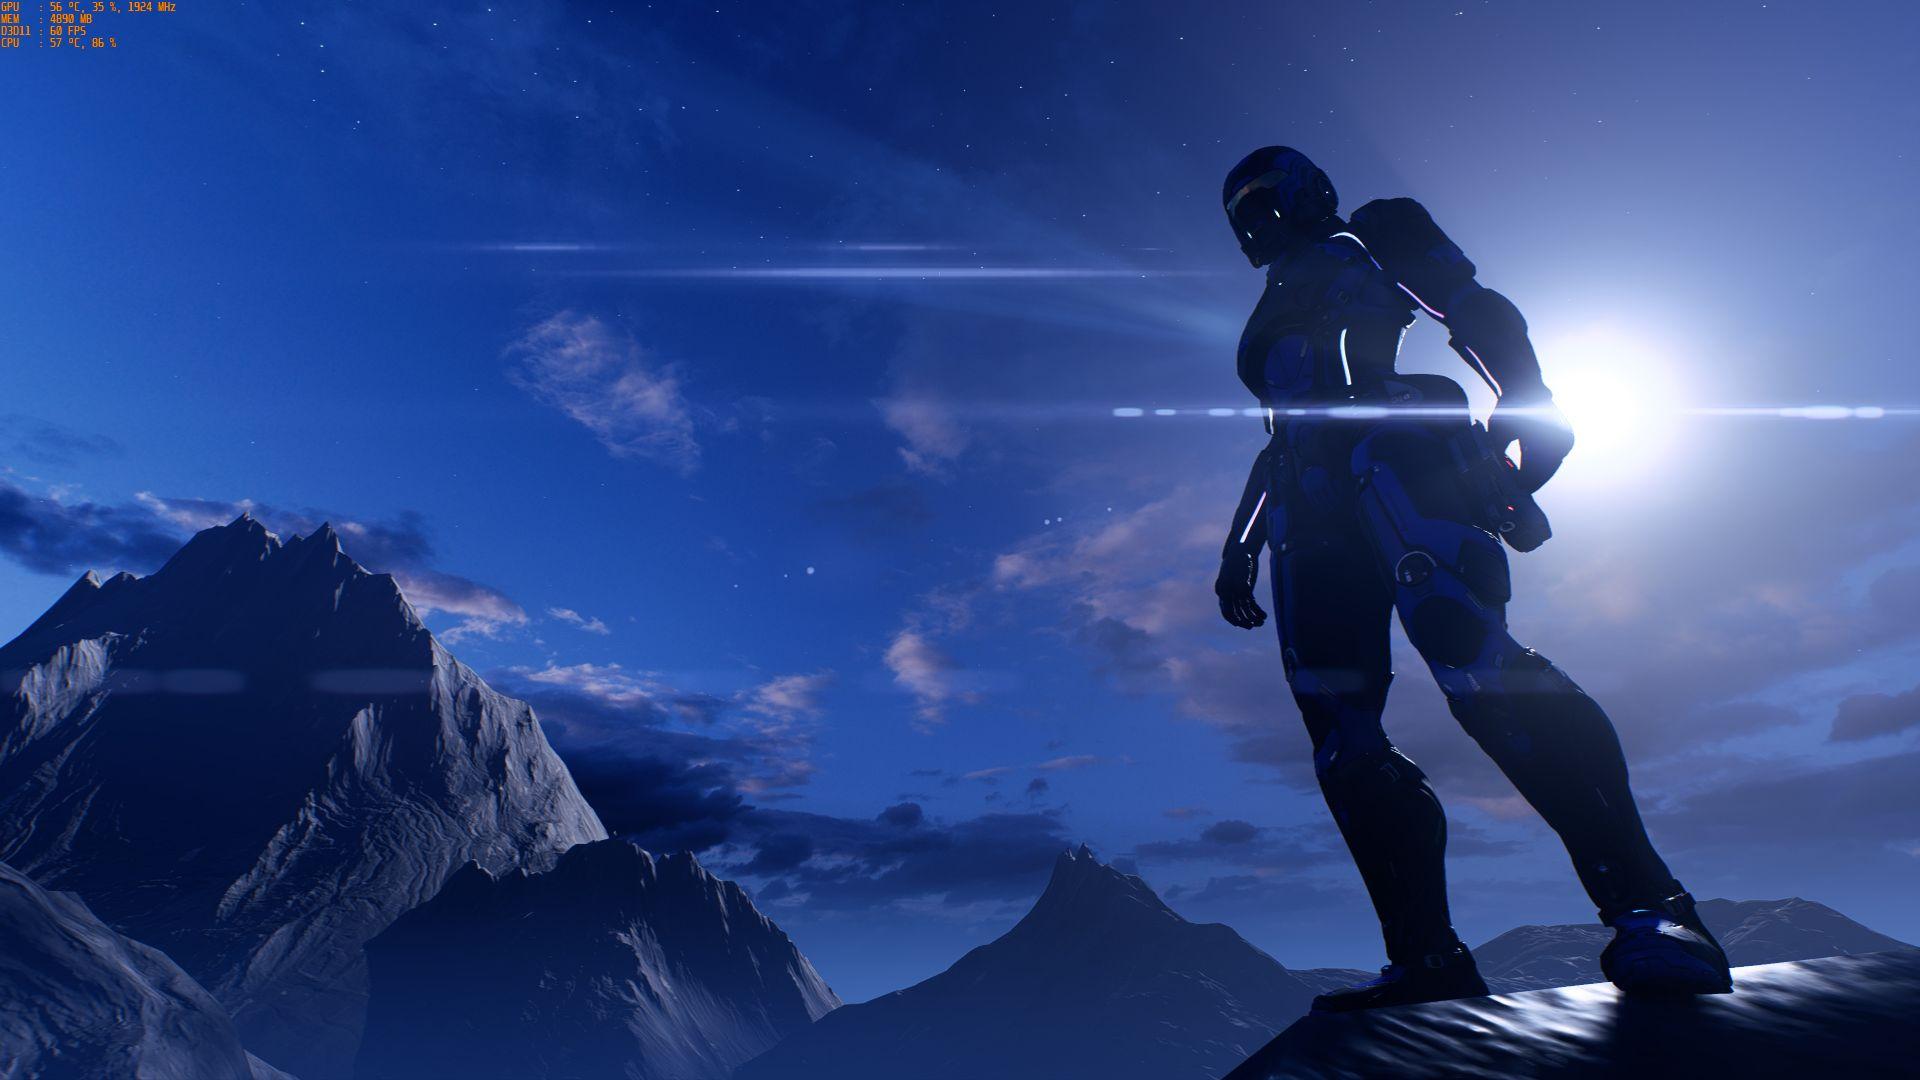 Mass Effect Andromeda Screenshot 2017.07.30 - 18.00.48.52.jpg - Mass Effect: Andromeda